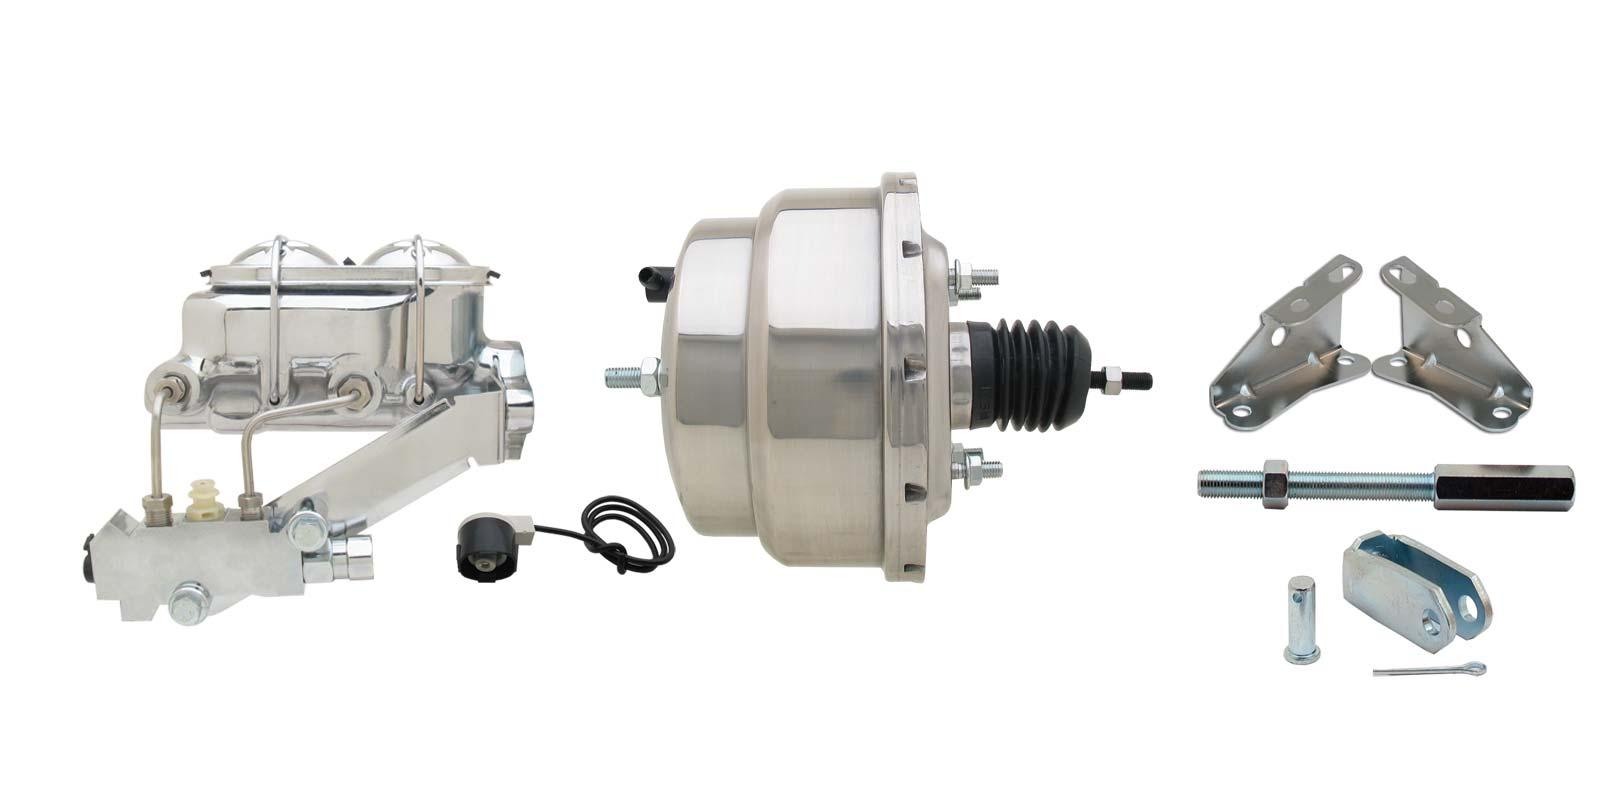 GM A, F, X 8 Dual Chrome Power Brake Booster Conversion Kit (Disc/ Drum)